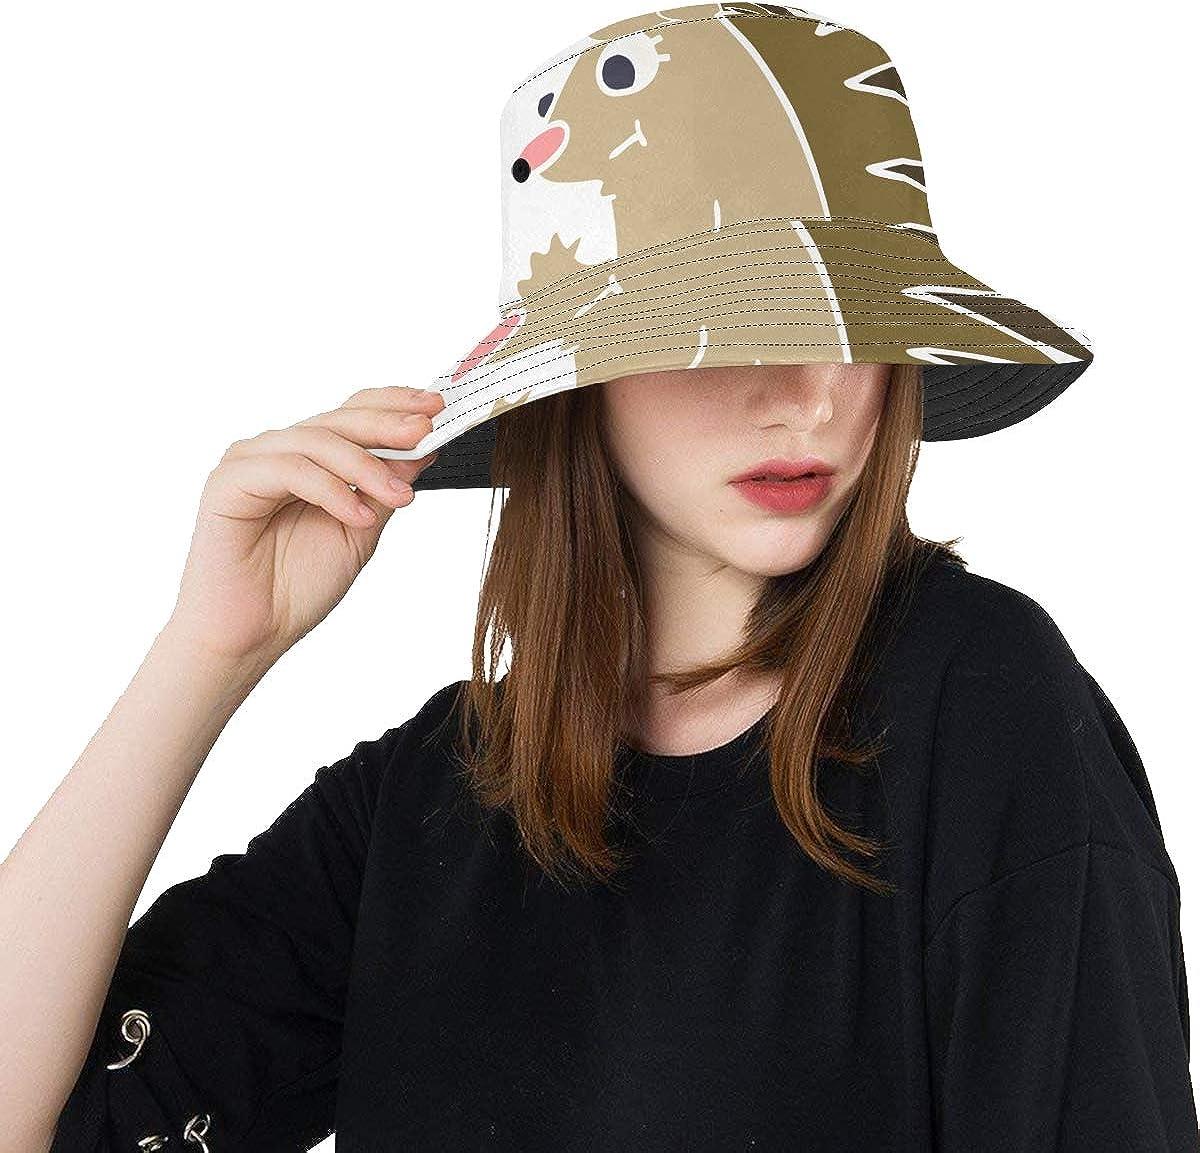 Ugly Hedgehog Cartoon Summer Unisex Fishing Sun Top Bucket Hats for Kid Teens Women and Men with Packable Fisherman Cap for Outdoor Baseball Sport Picnic